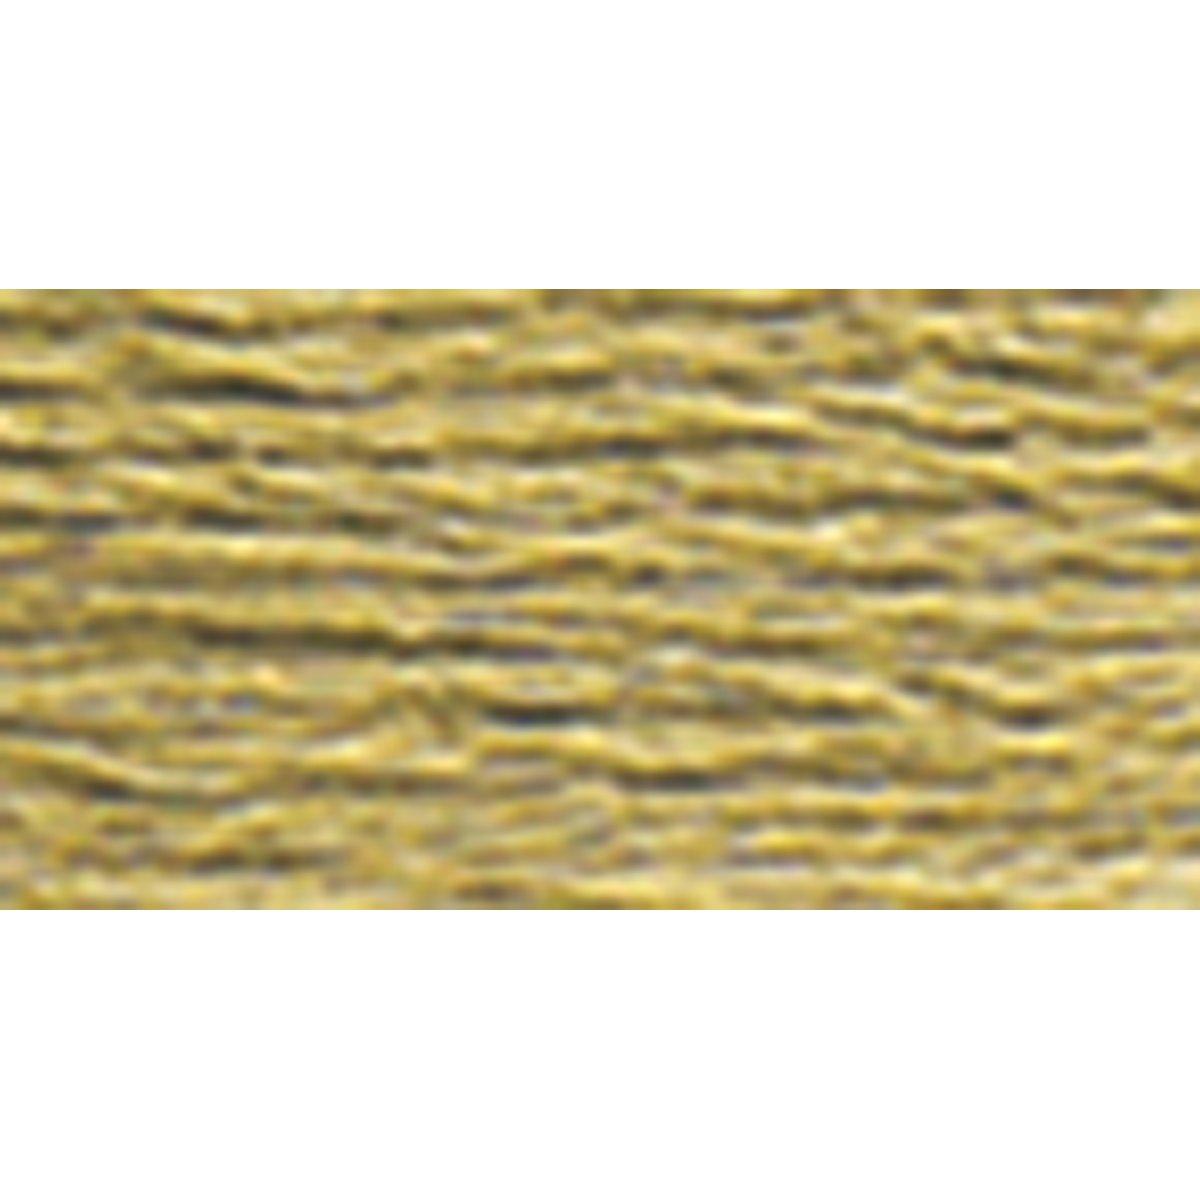 DMC 6-Strand Embroidery Cotton 8.7yd-Light Brown Grey